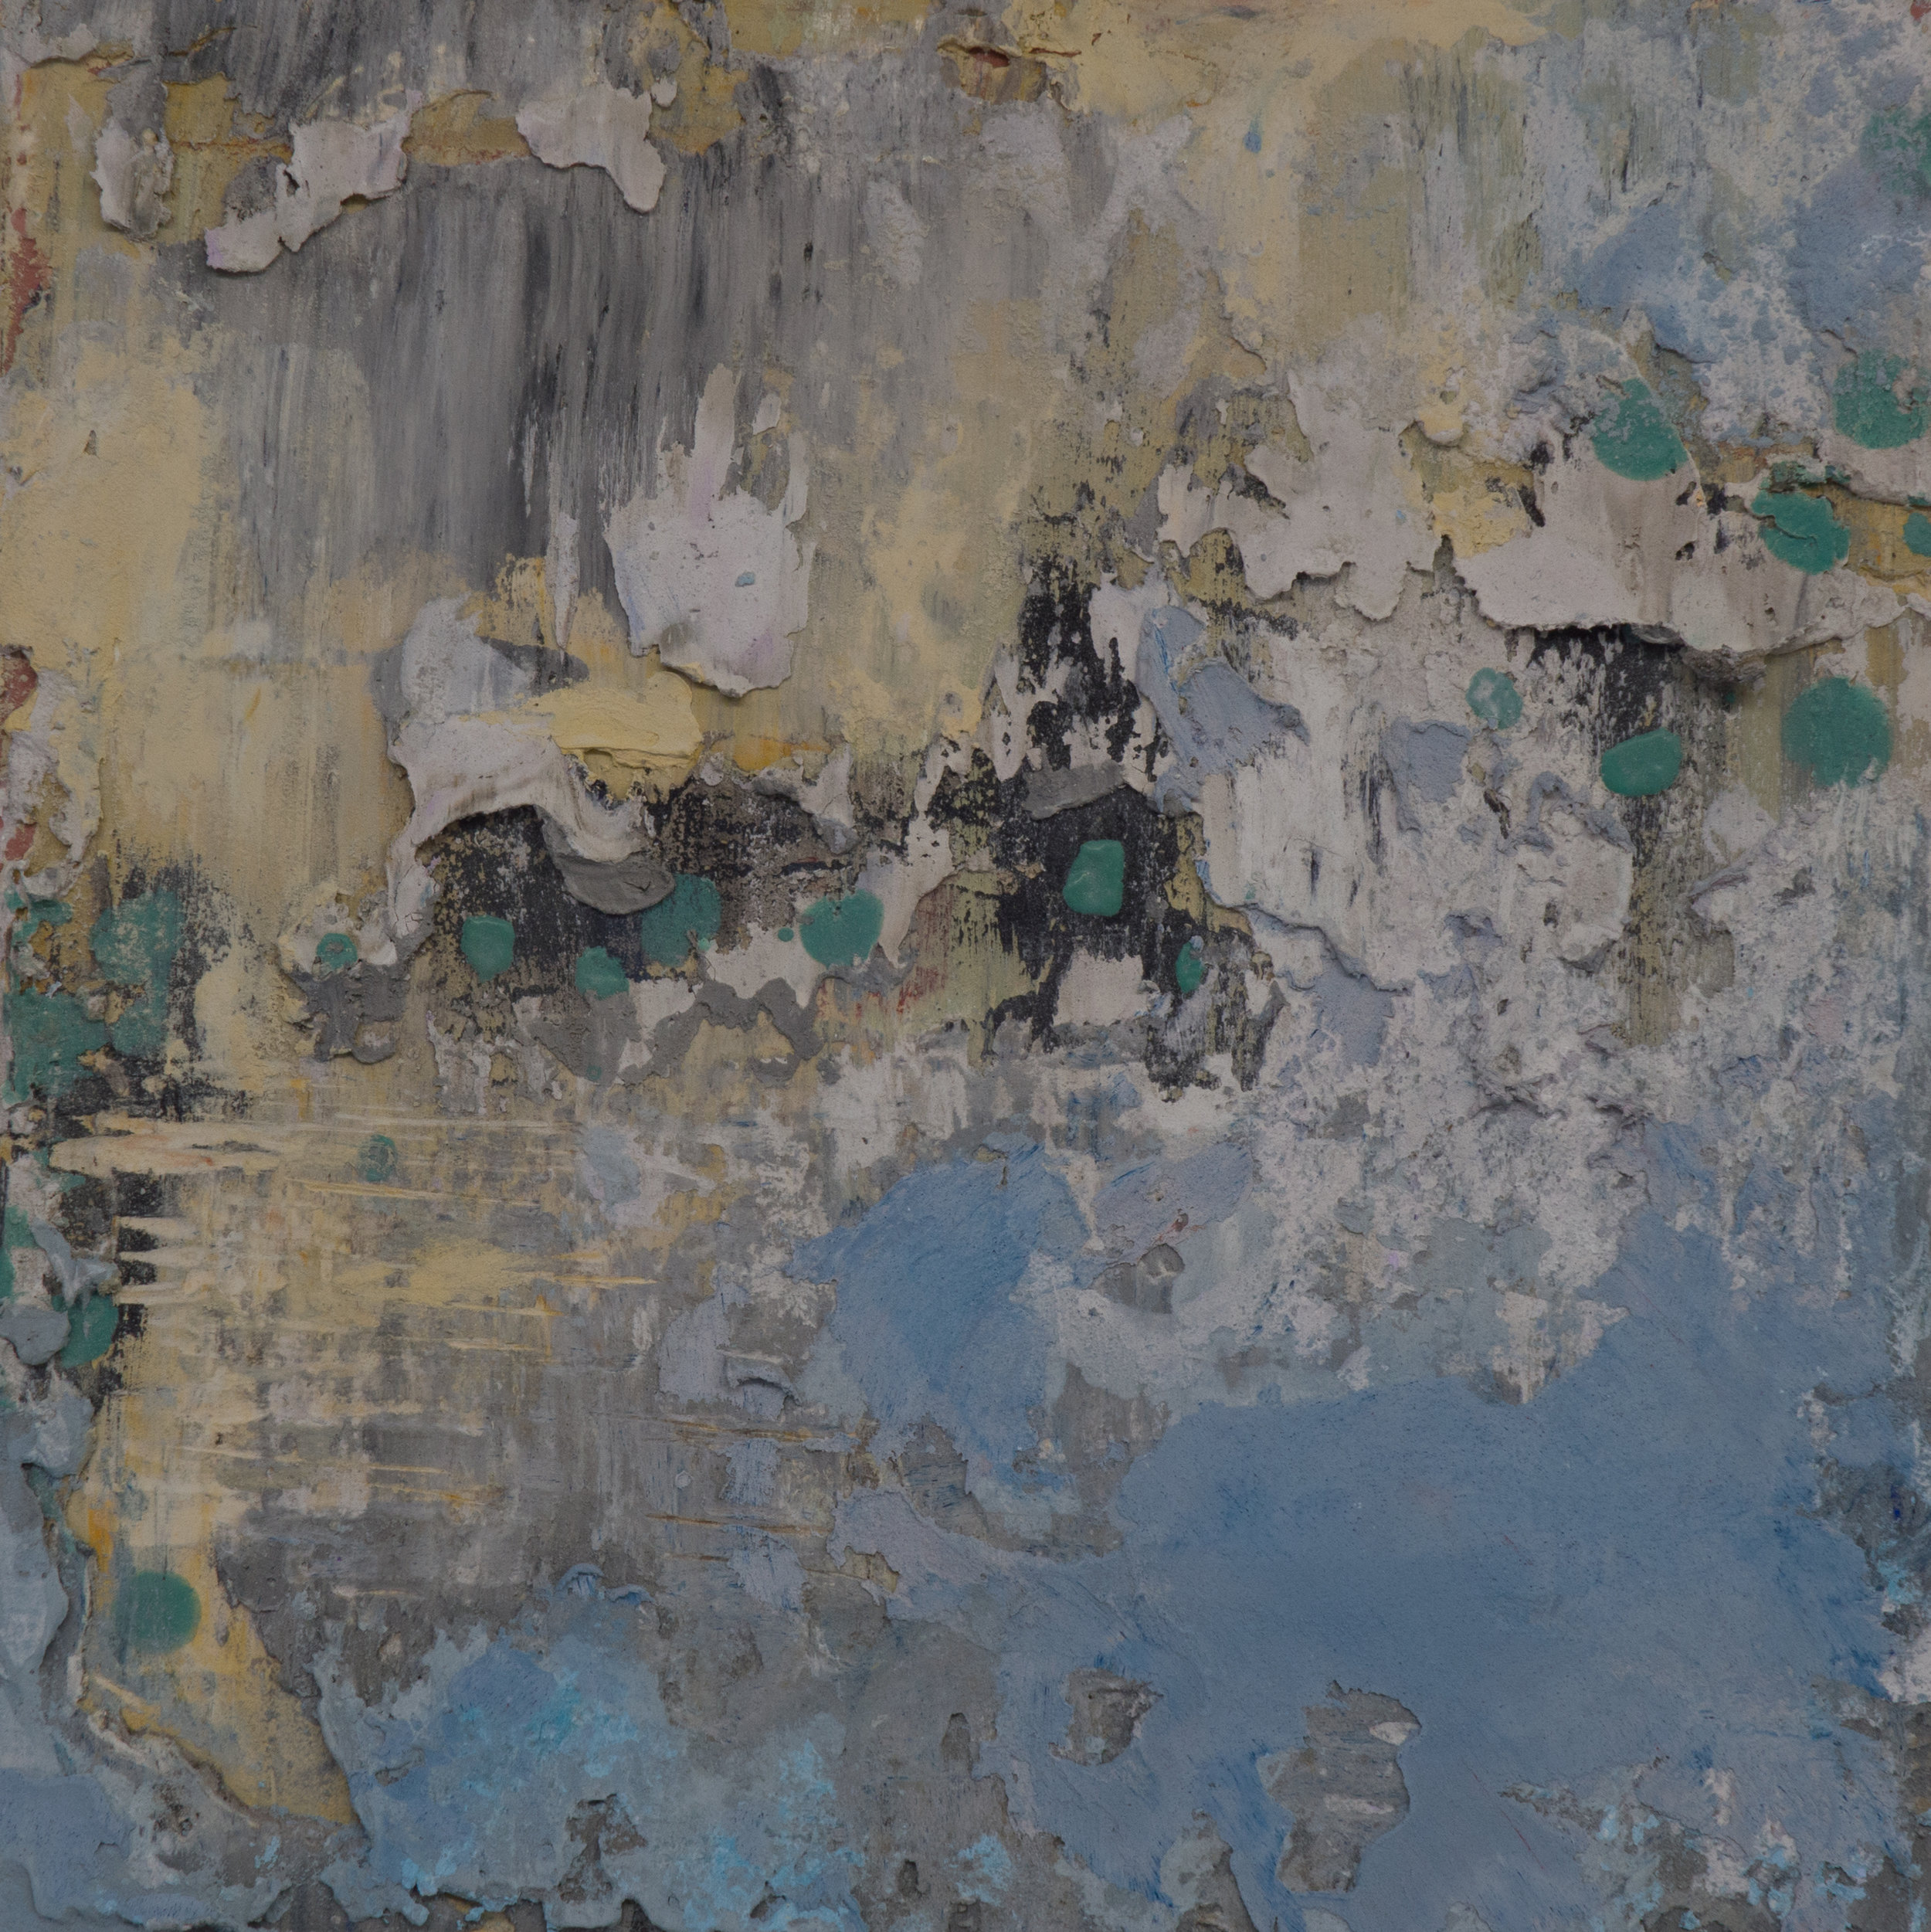 Shelley Vanderbyl - Easing Up (Full Crop) - 2016 - Fresco on Panel - 8x8.jpg